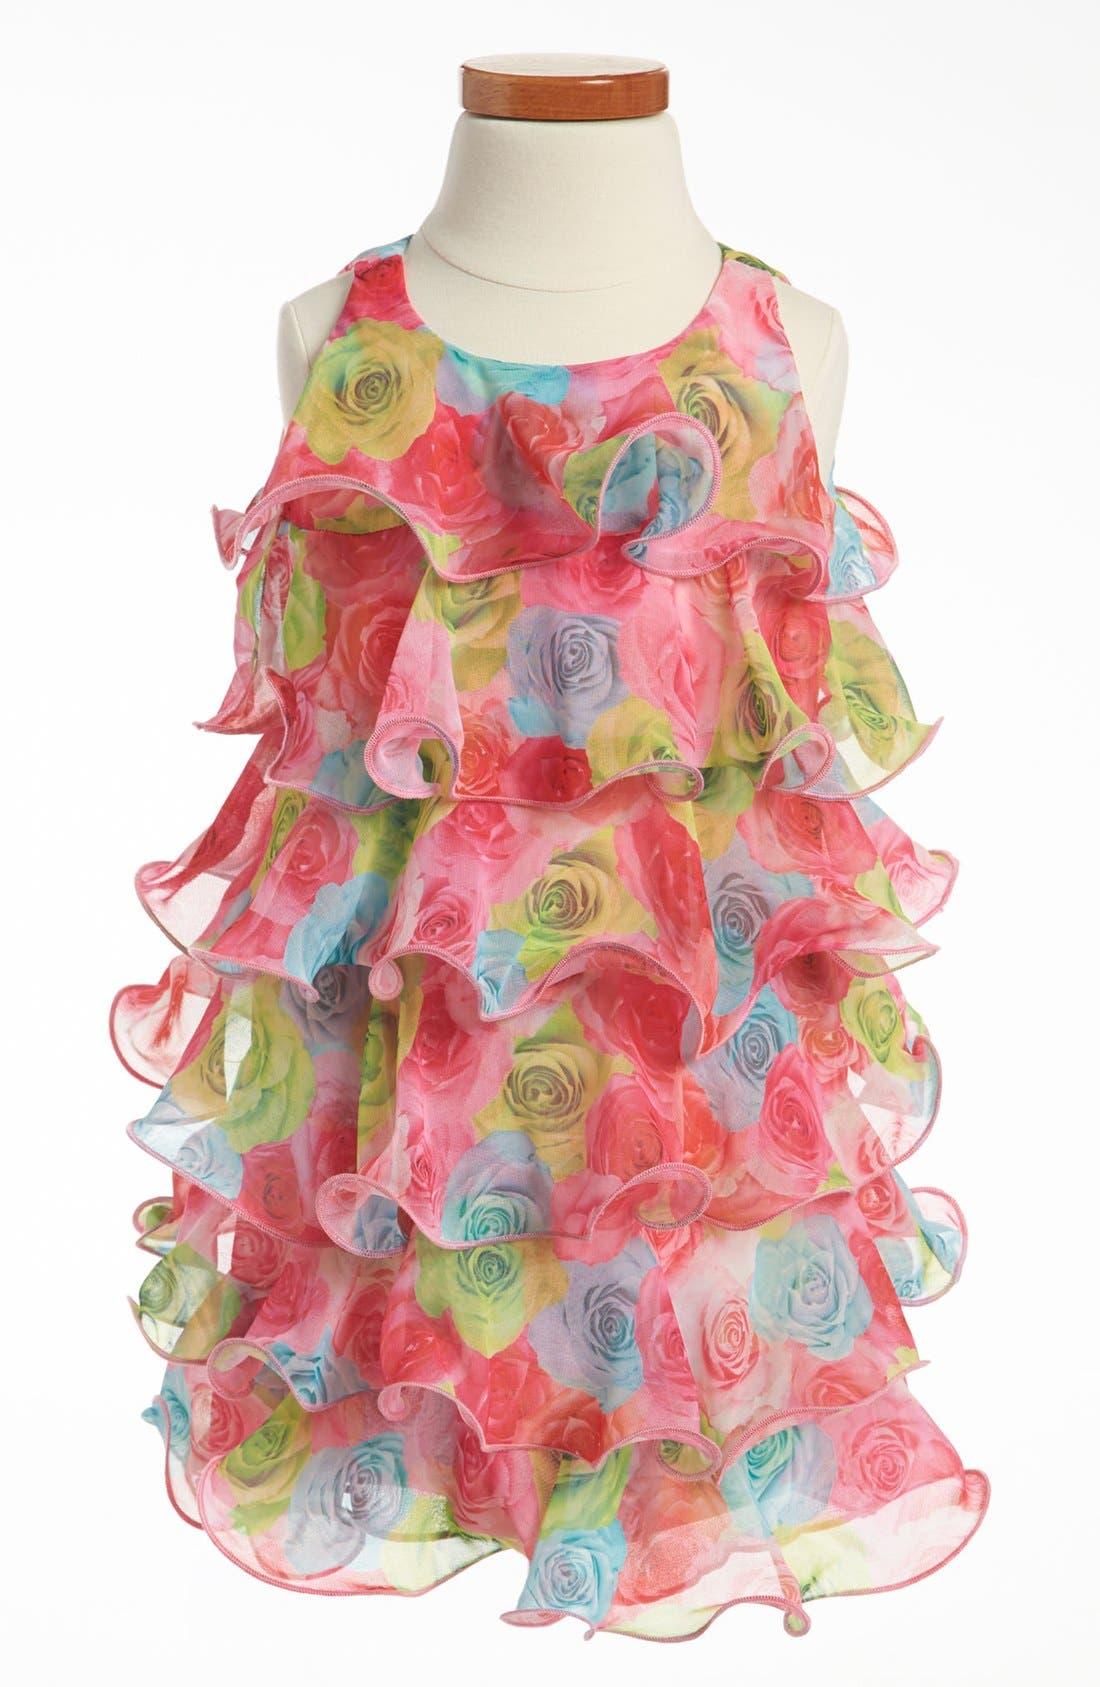 Alternate Image 1 Selected - Biscotti Ruffle Dress (Toddler)